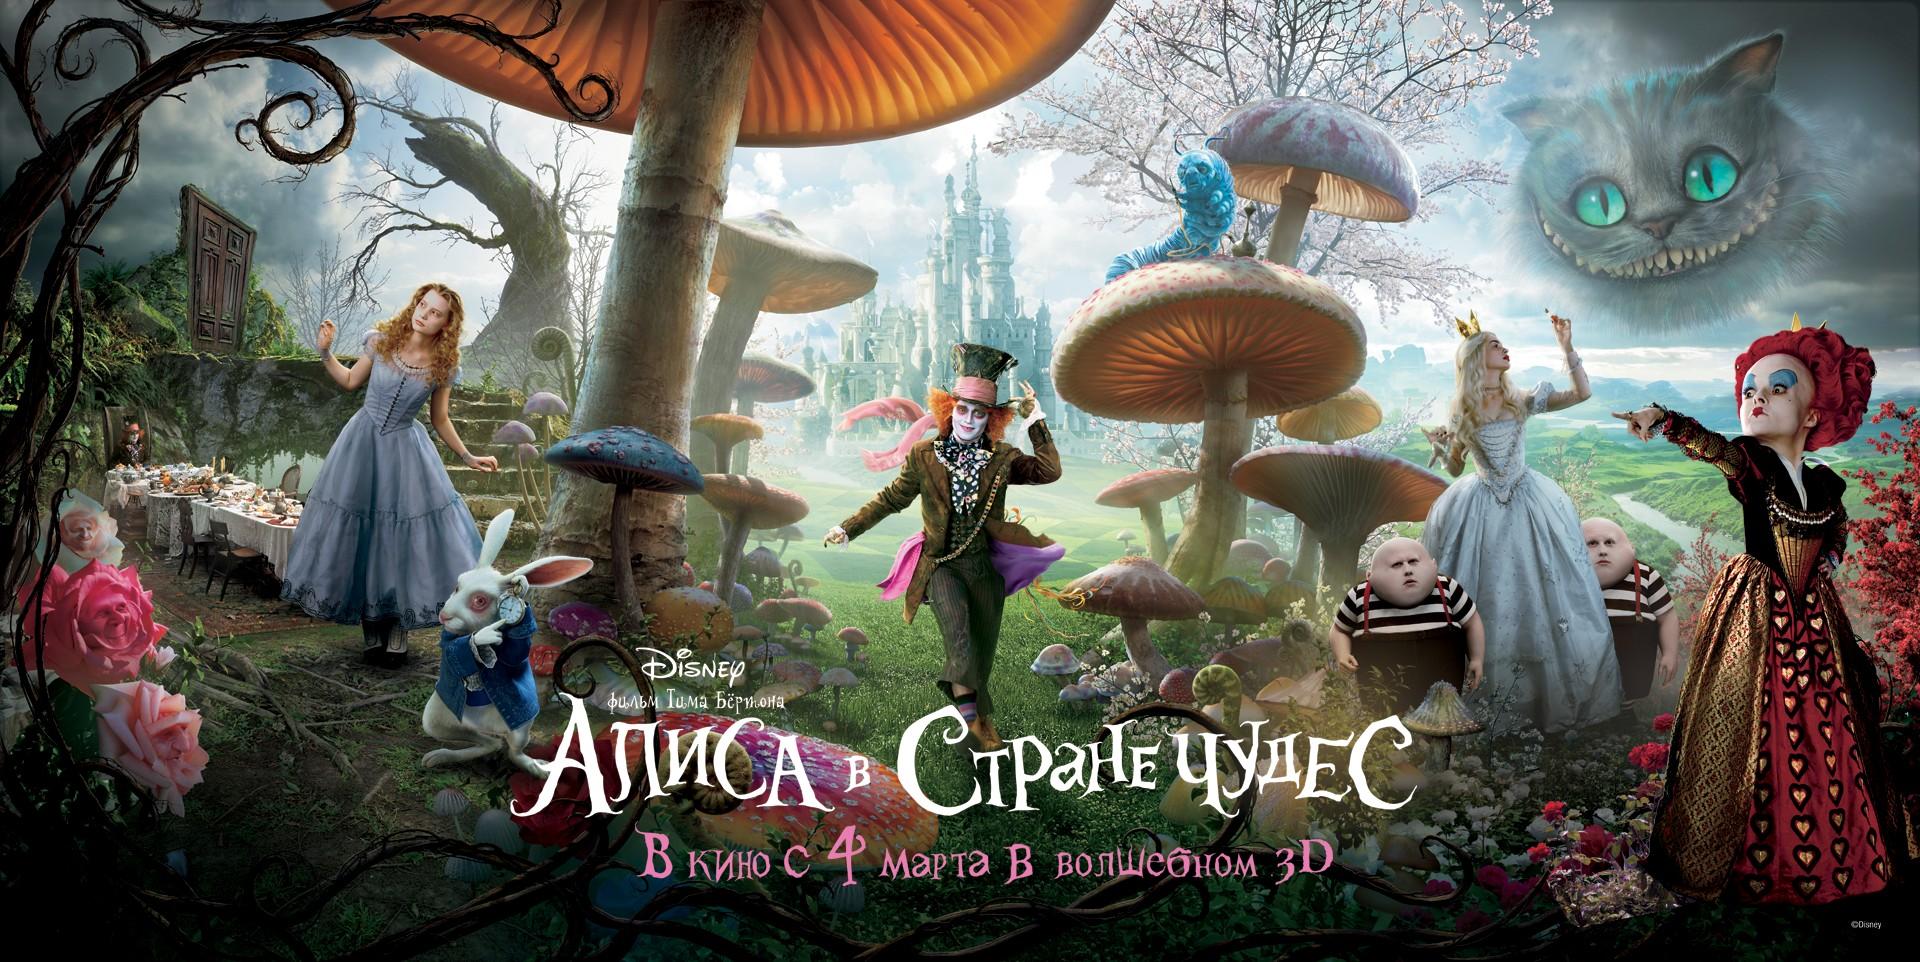 Алиса в Стране чудес, постер № 21